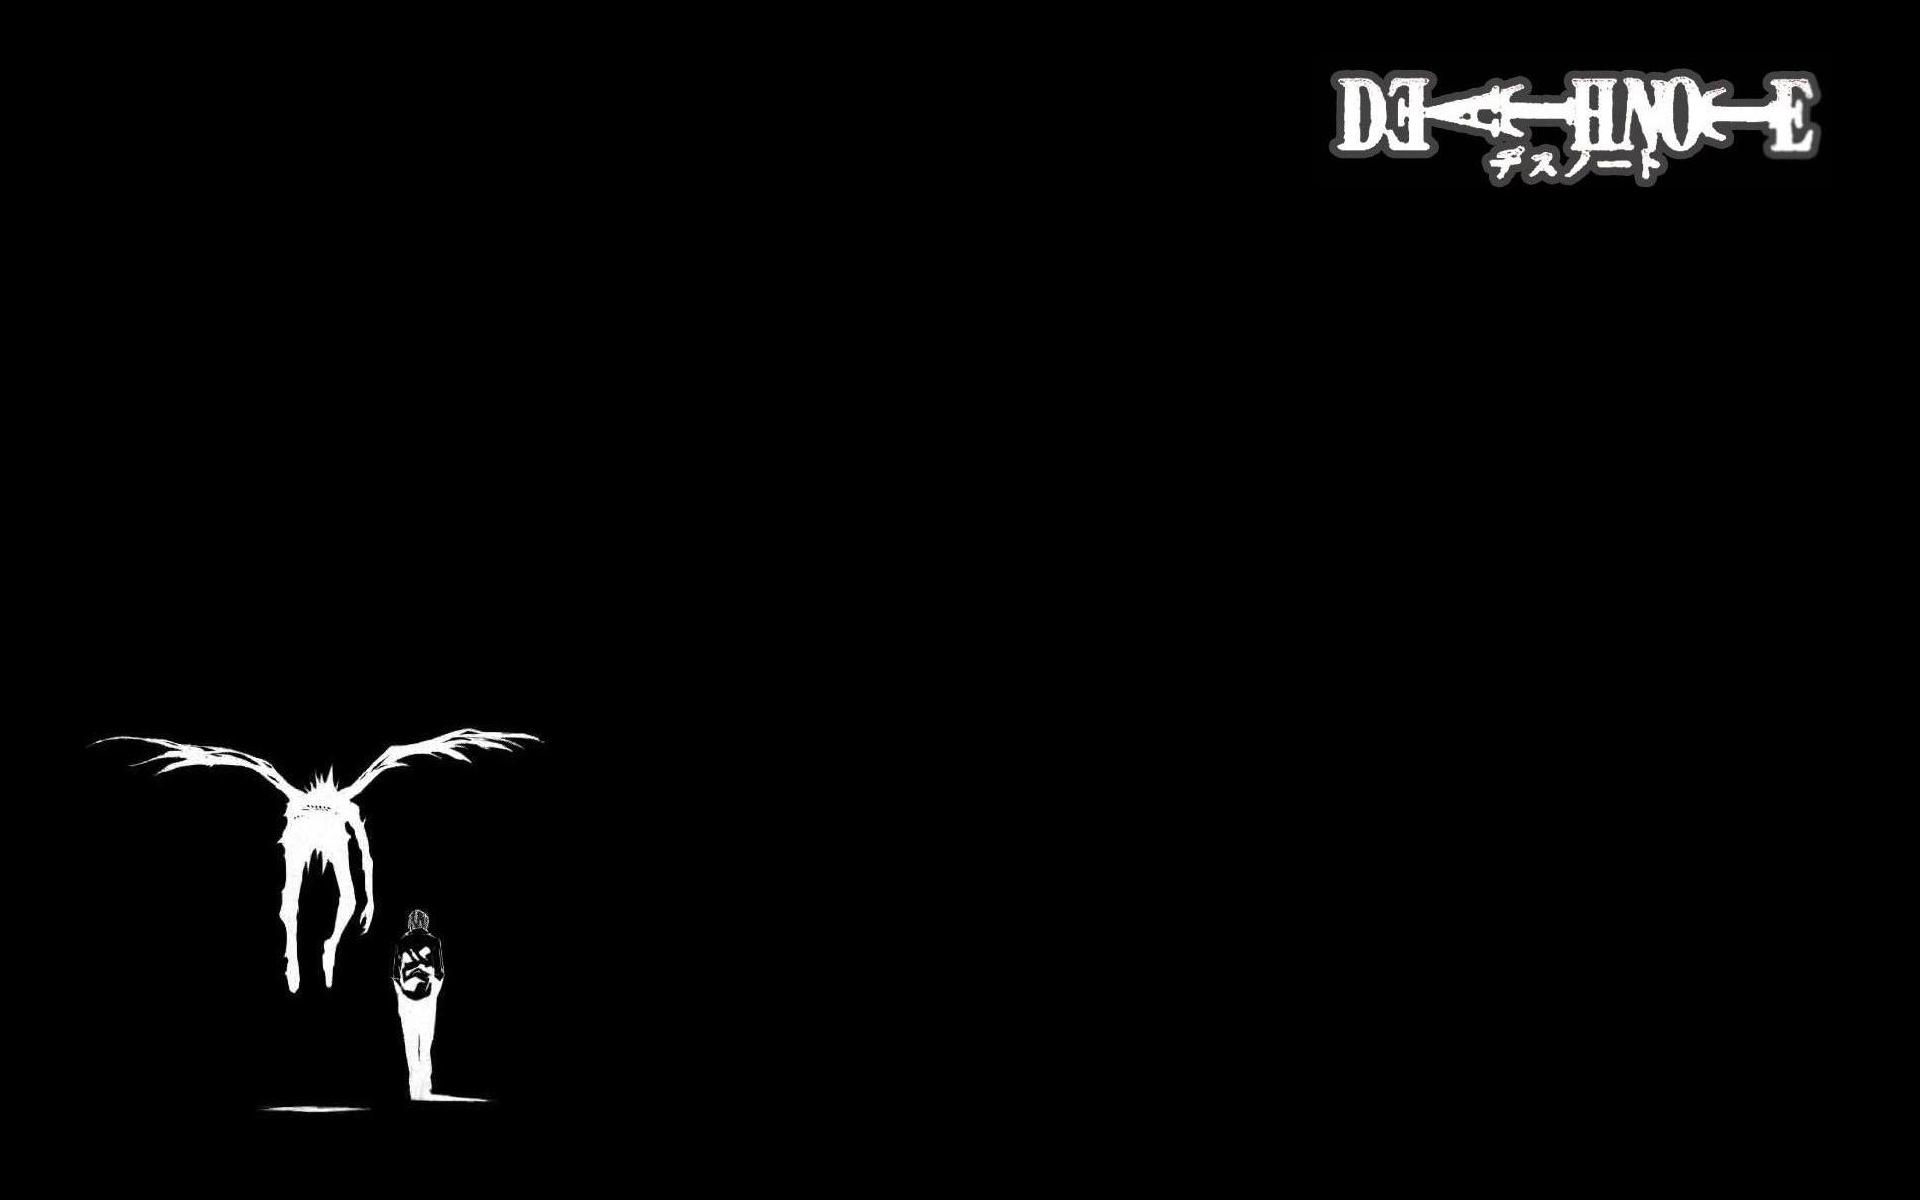 47 Death Note Wallpaper Iphone On Wallpapersafari